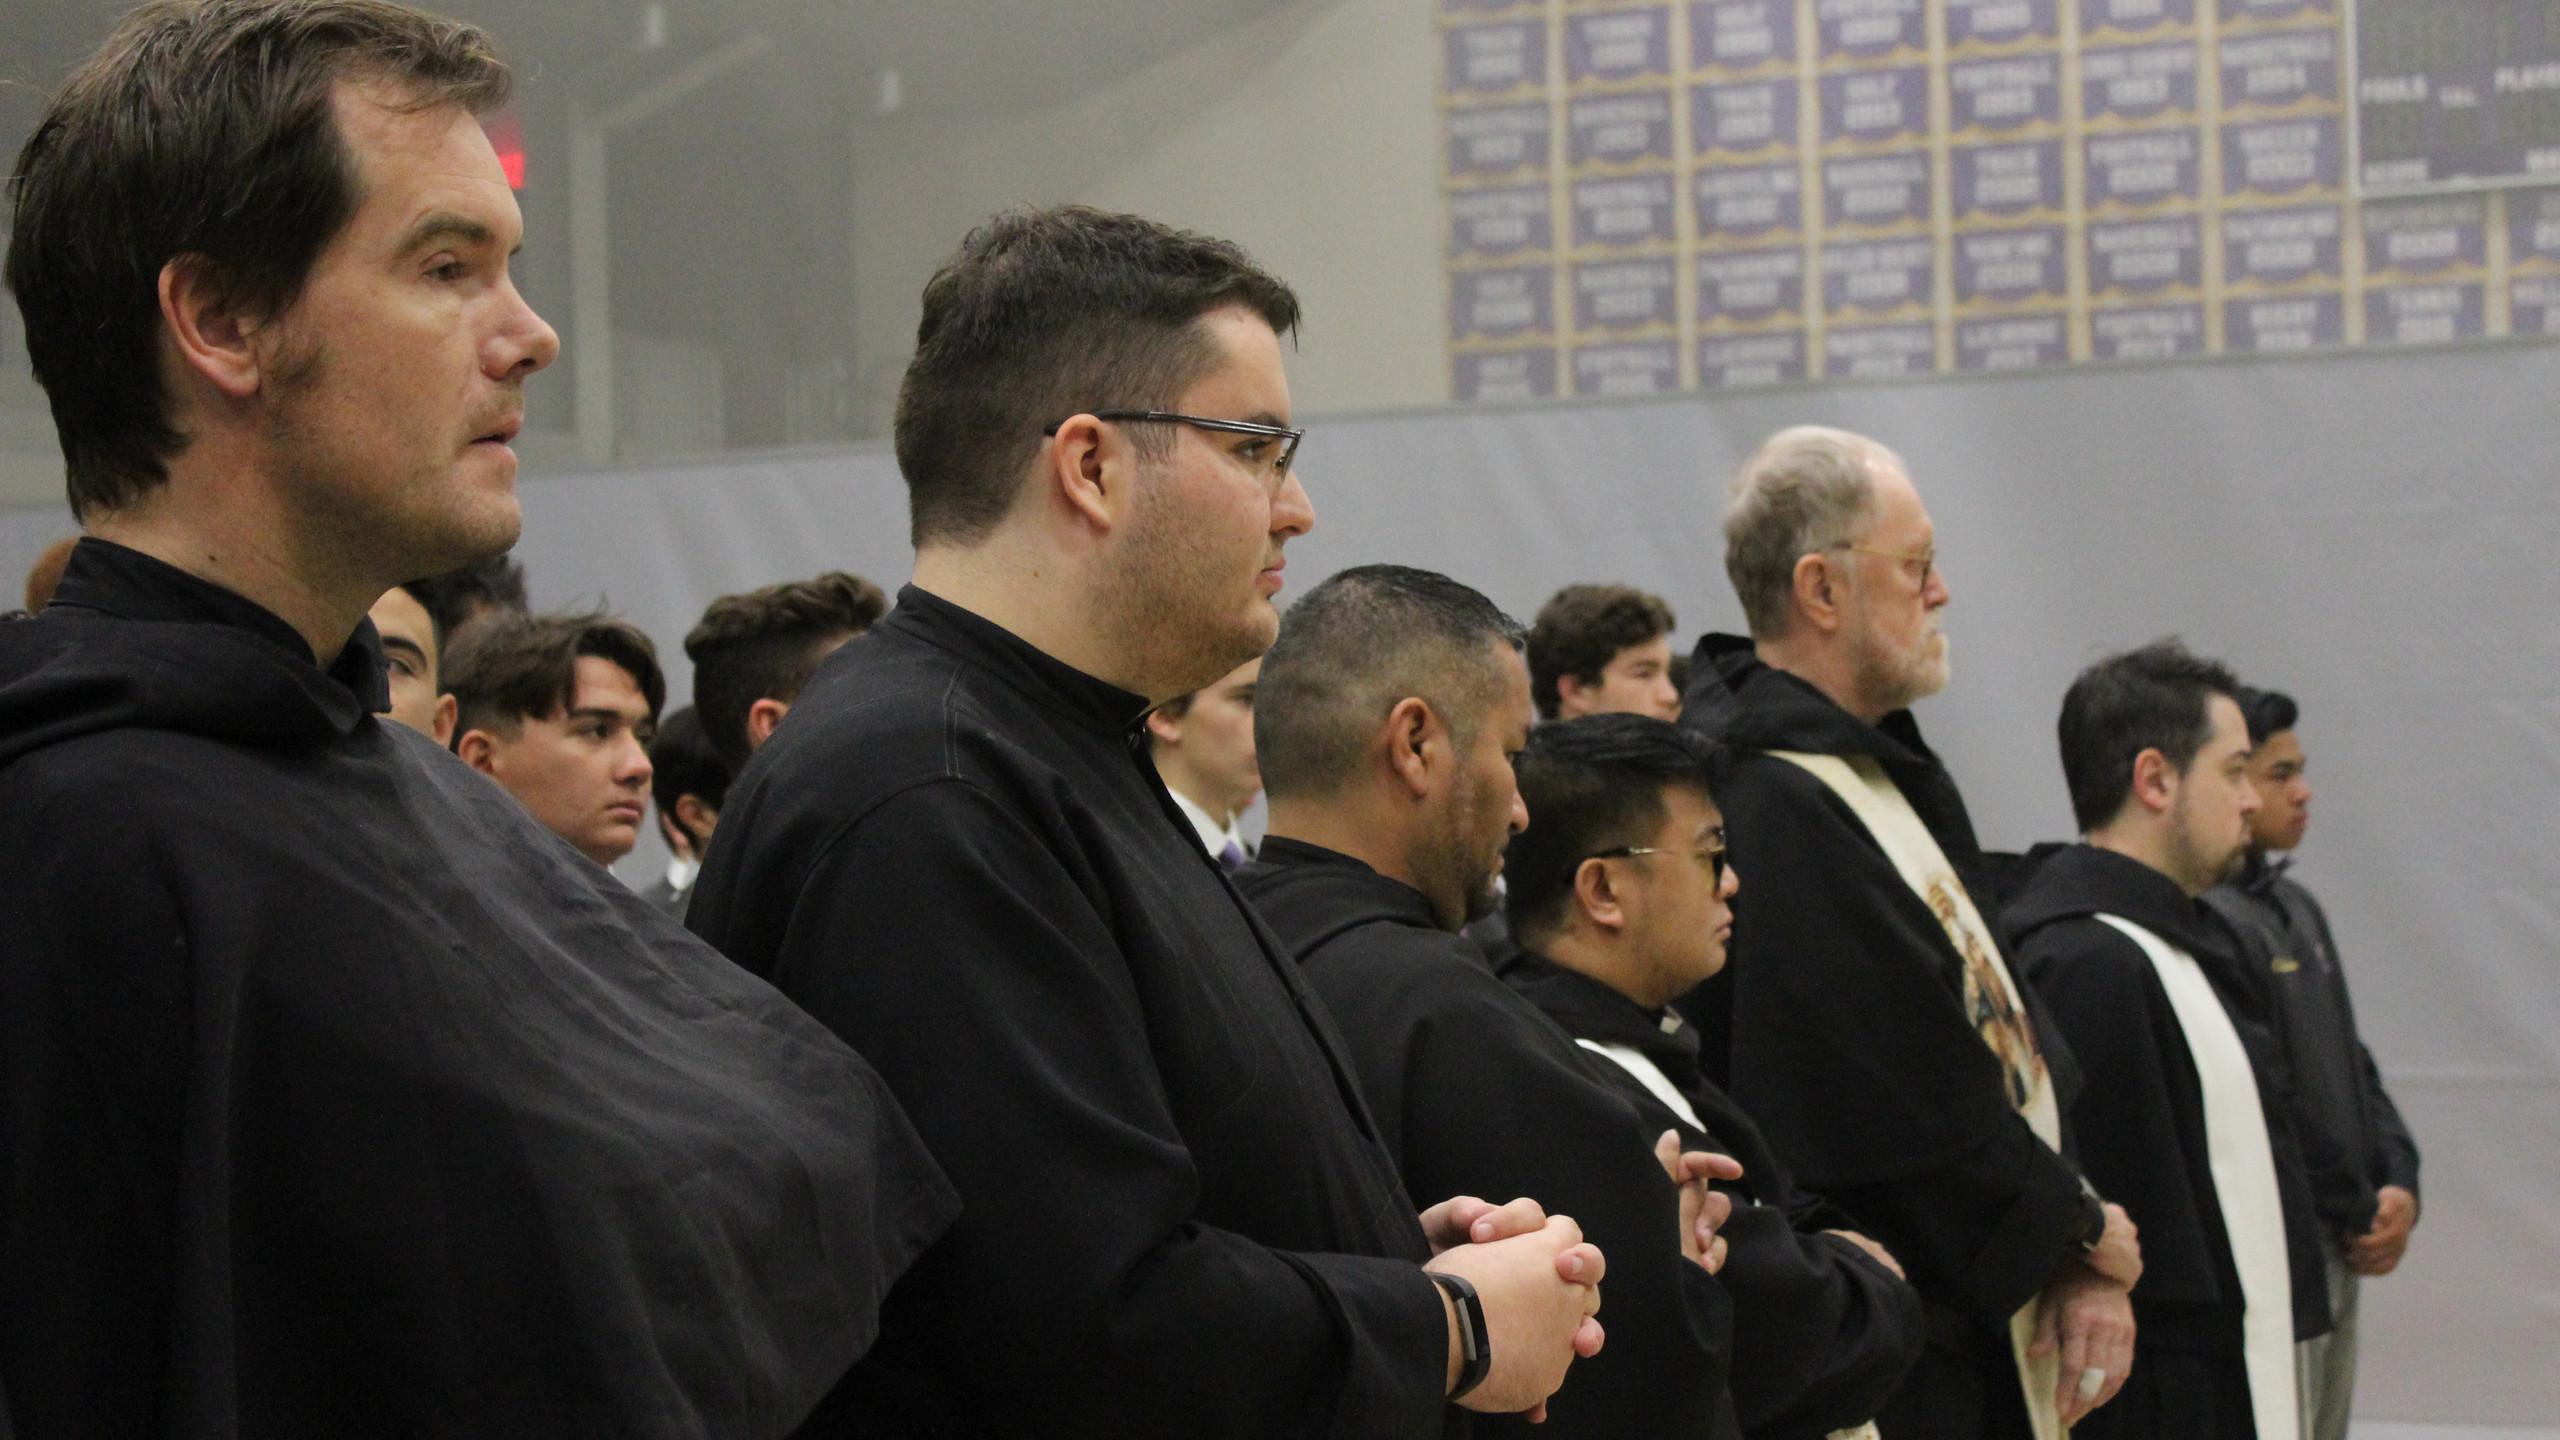 Brothers at Prayer